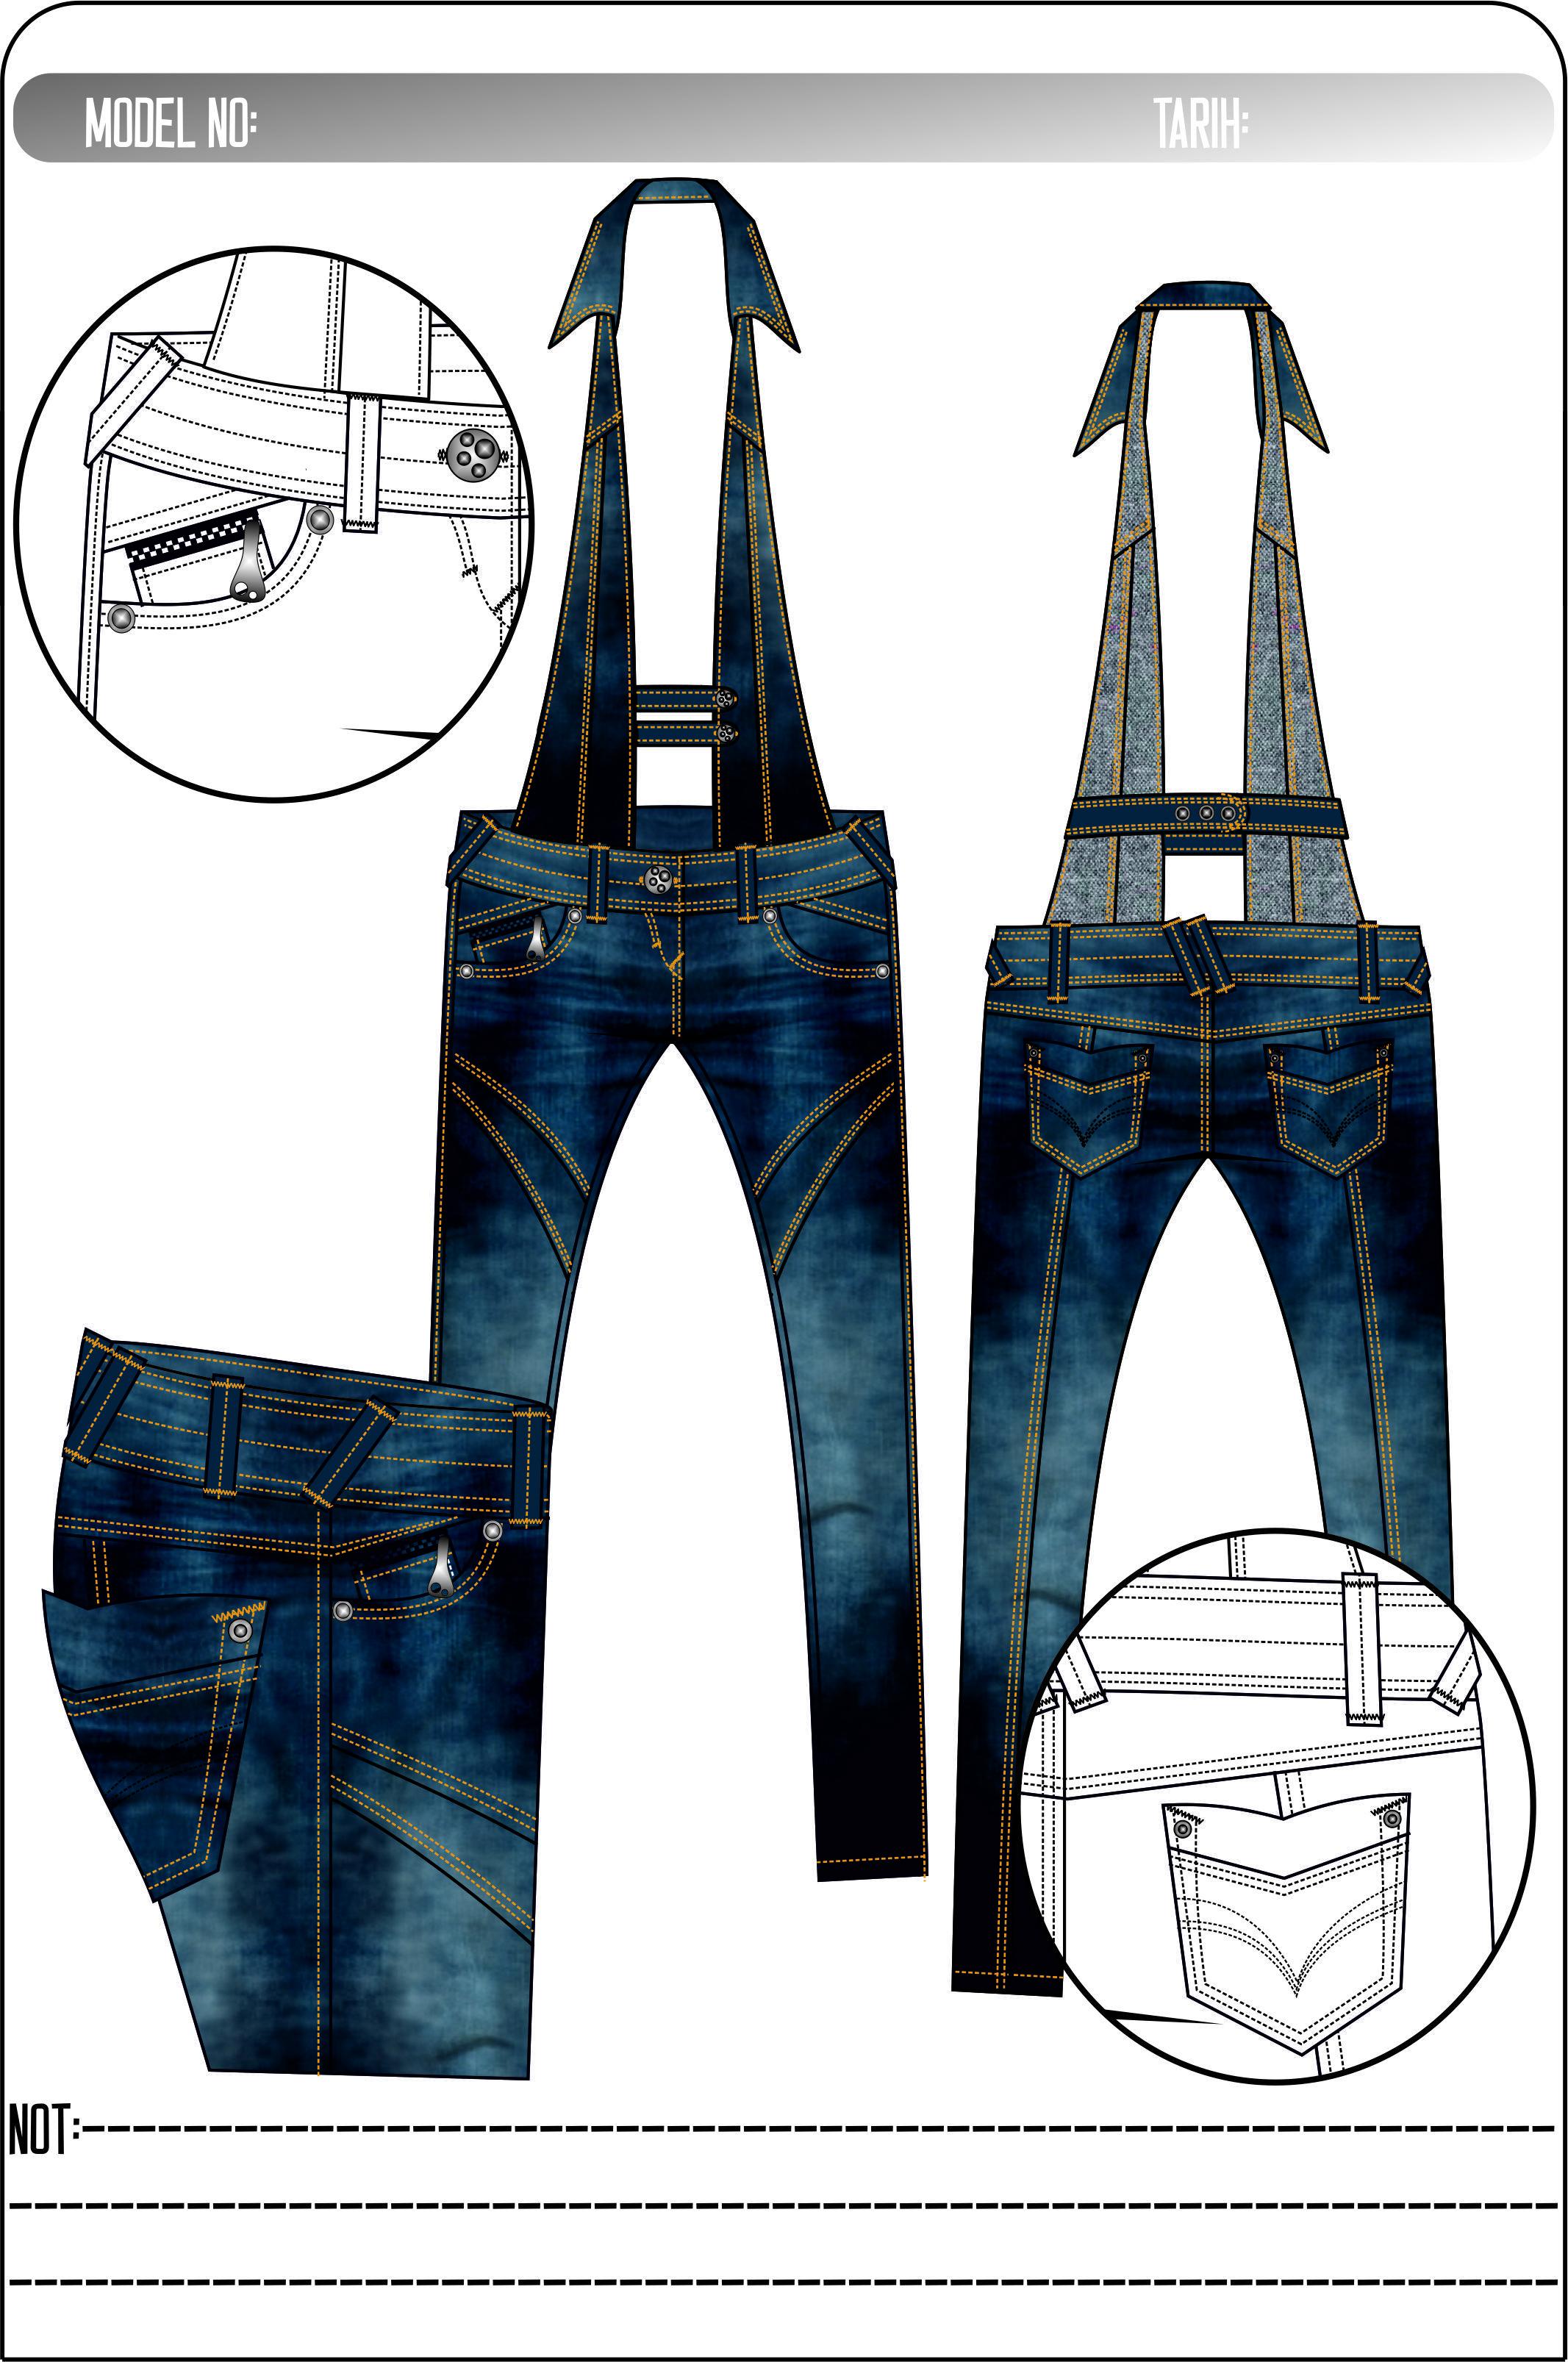 Pin de tecnico en Pantalones | Pinterest | Jeans femeninos, Diseño ...